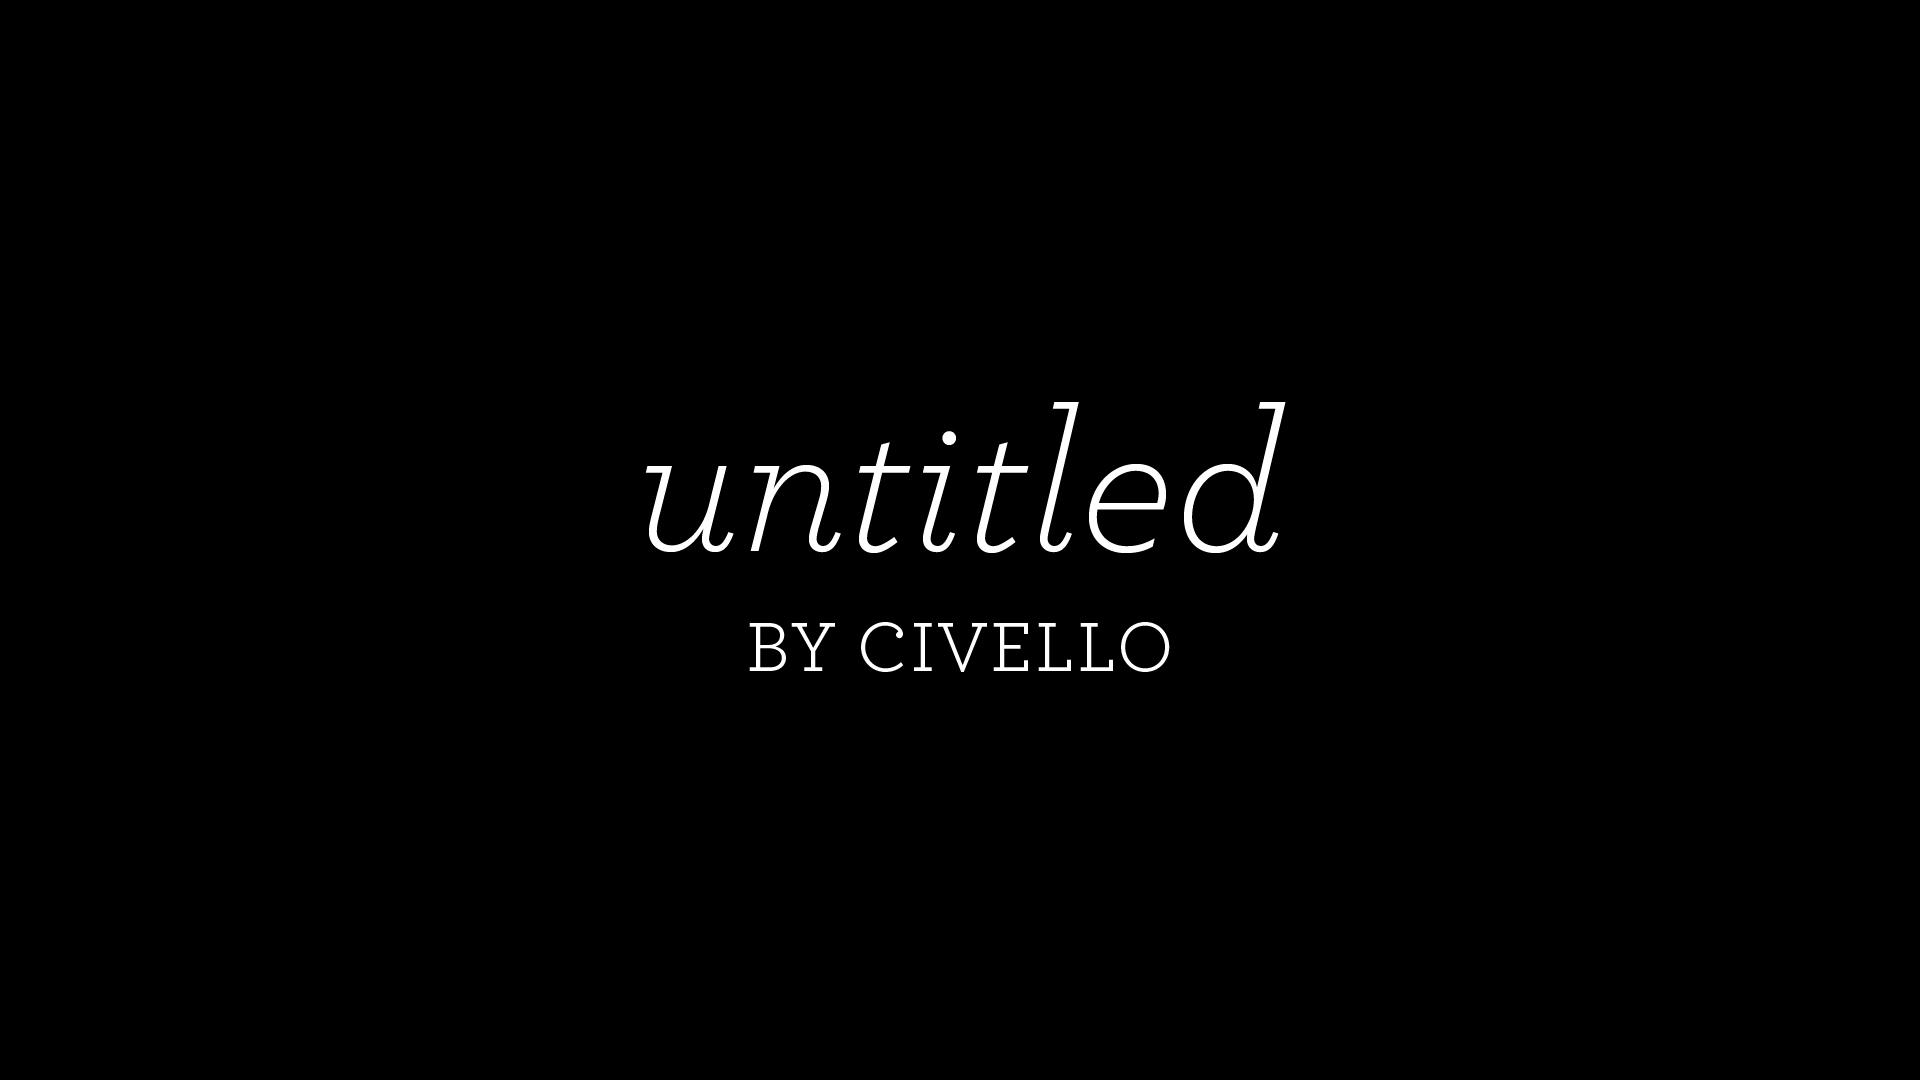 Untitled_Slide_1920x1080_byCivello.jpg